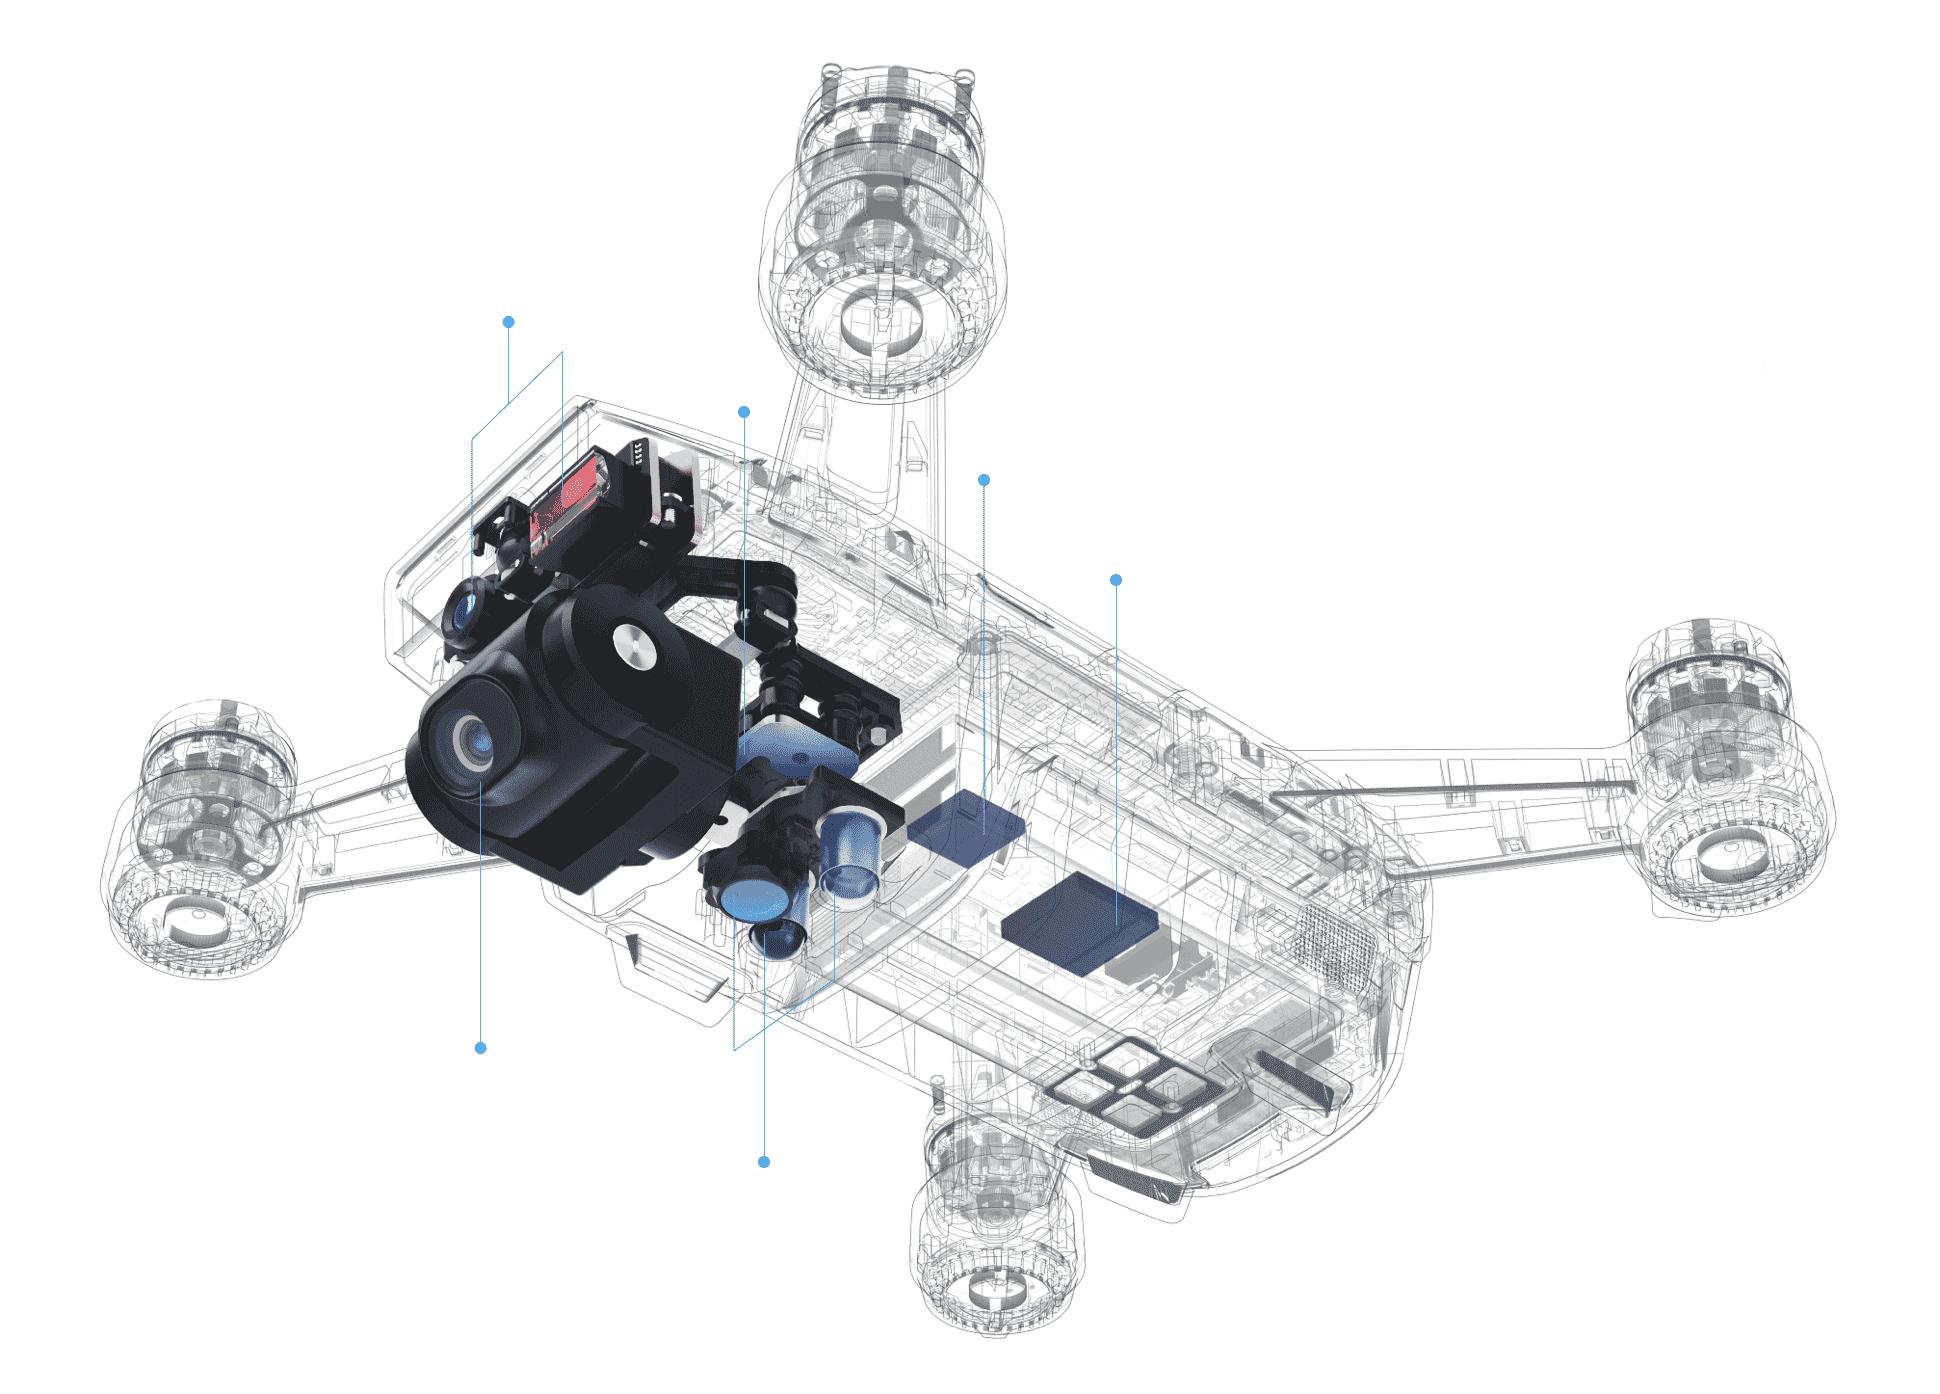 Квадрокоптер Spark в разрезе